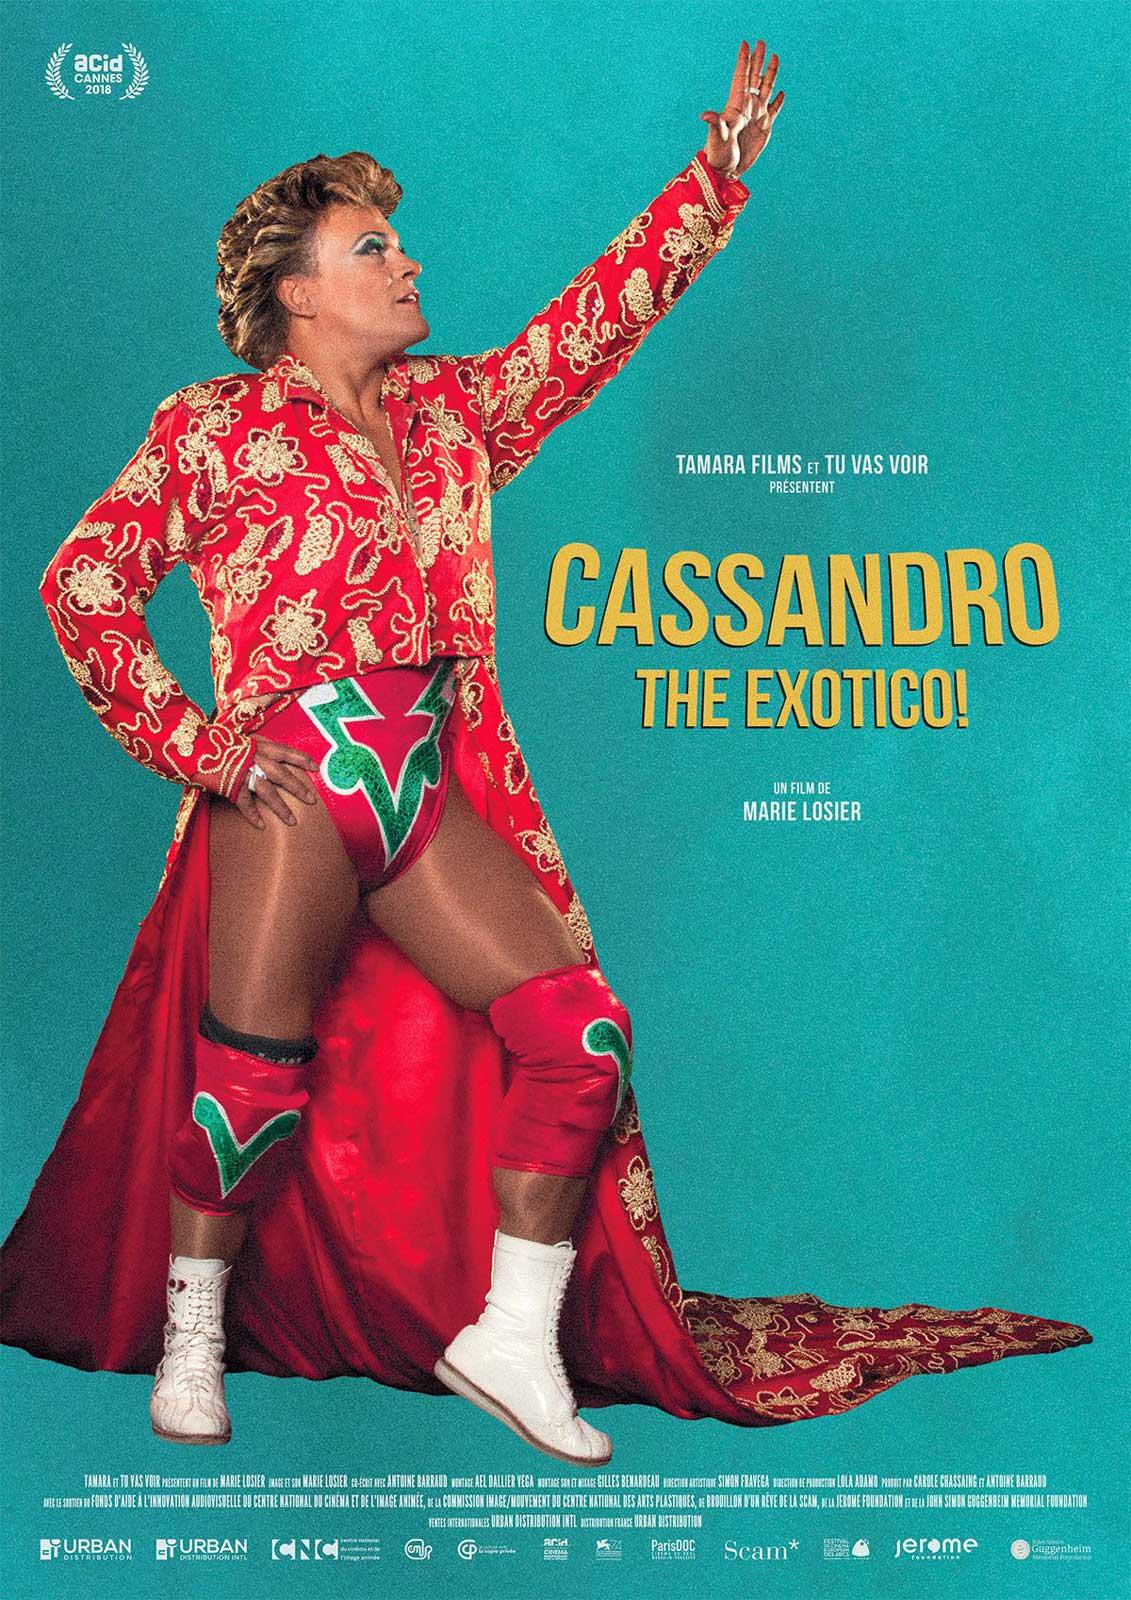 Cassandro The Exotico!